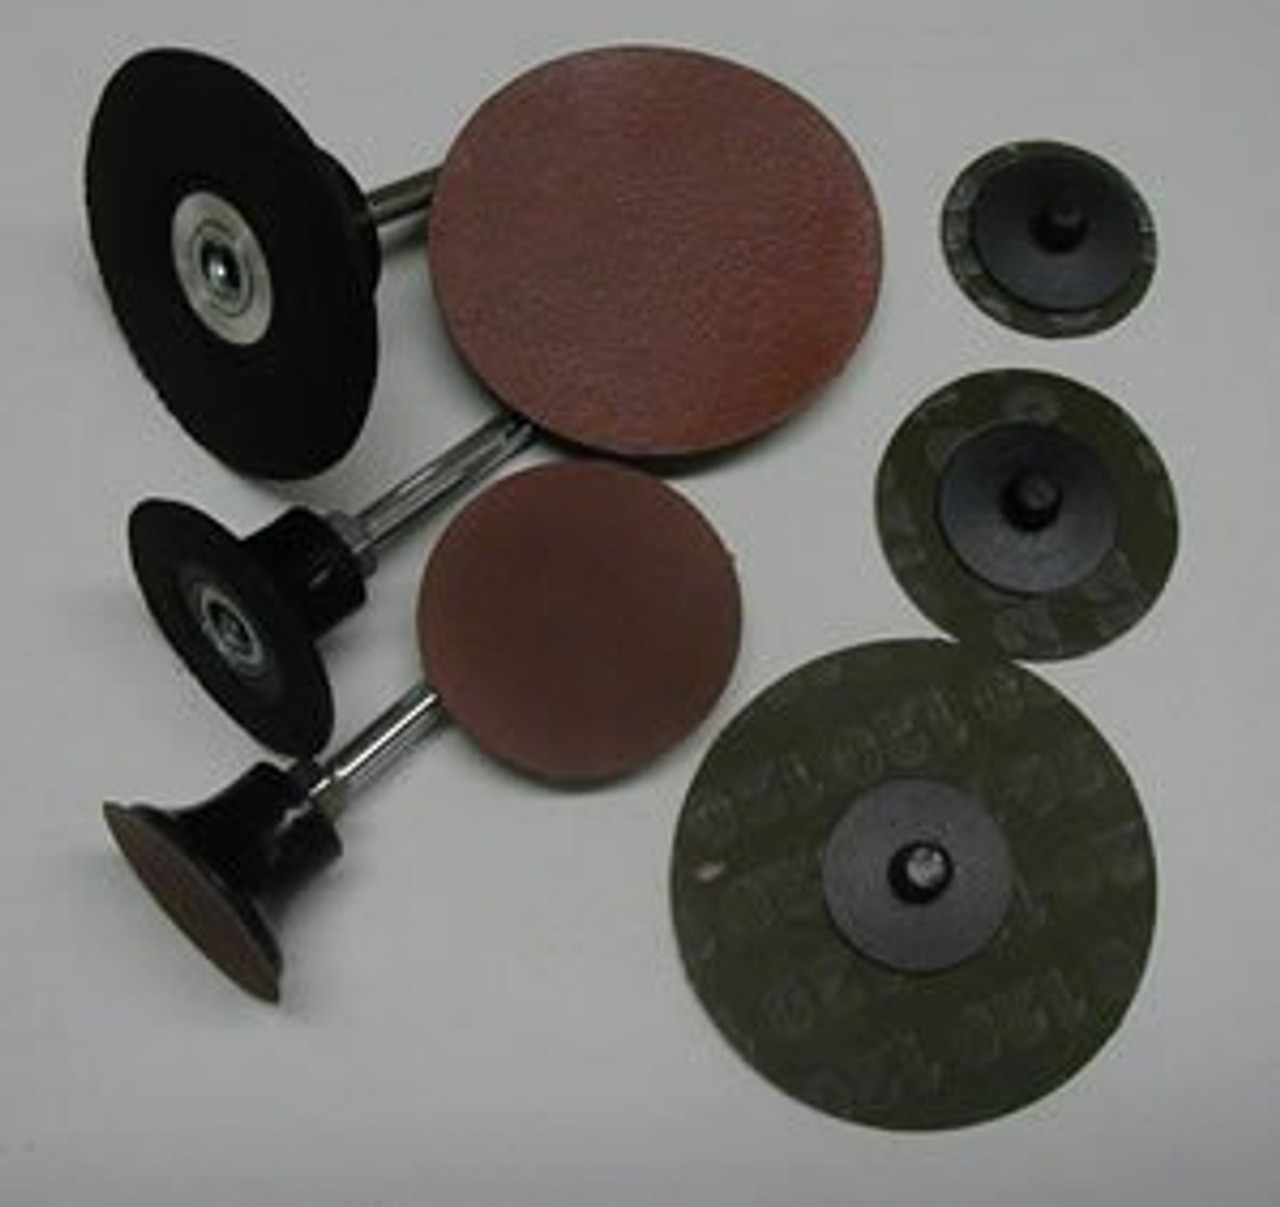 "Aluminum Oxide Sanding Disk 1.5"" - 50 Grit"